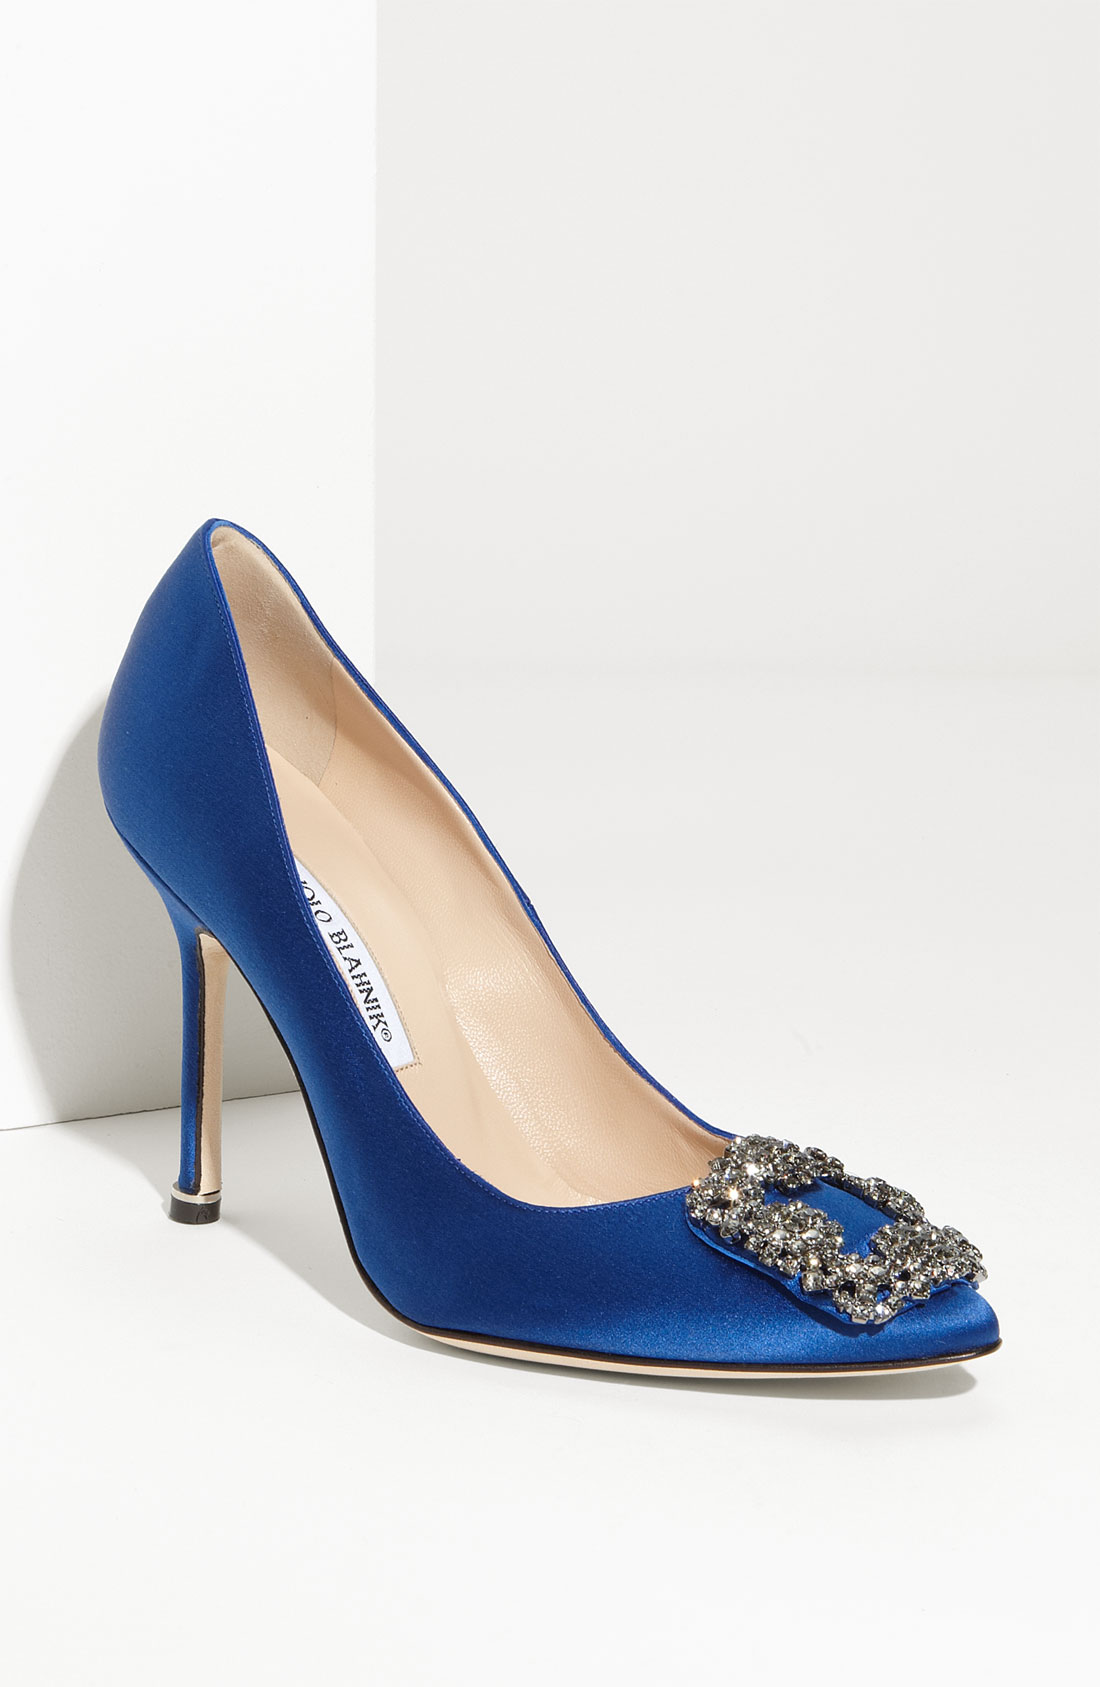 Manolo Blahnik Hangisi Jeweled Pump In Blue Blue Satin